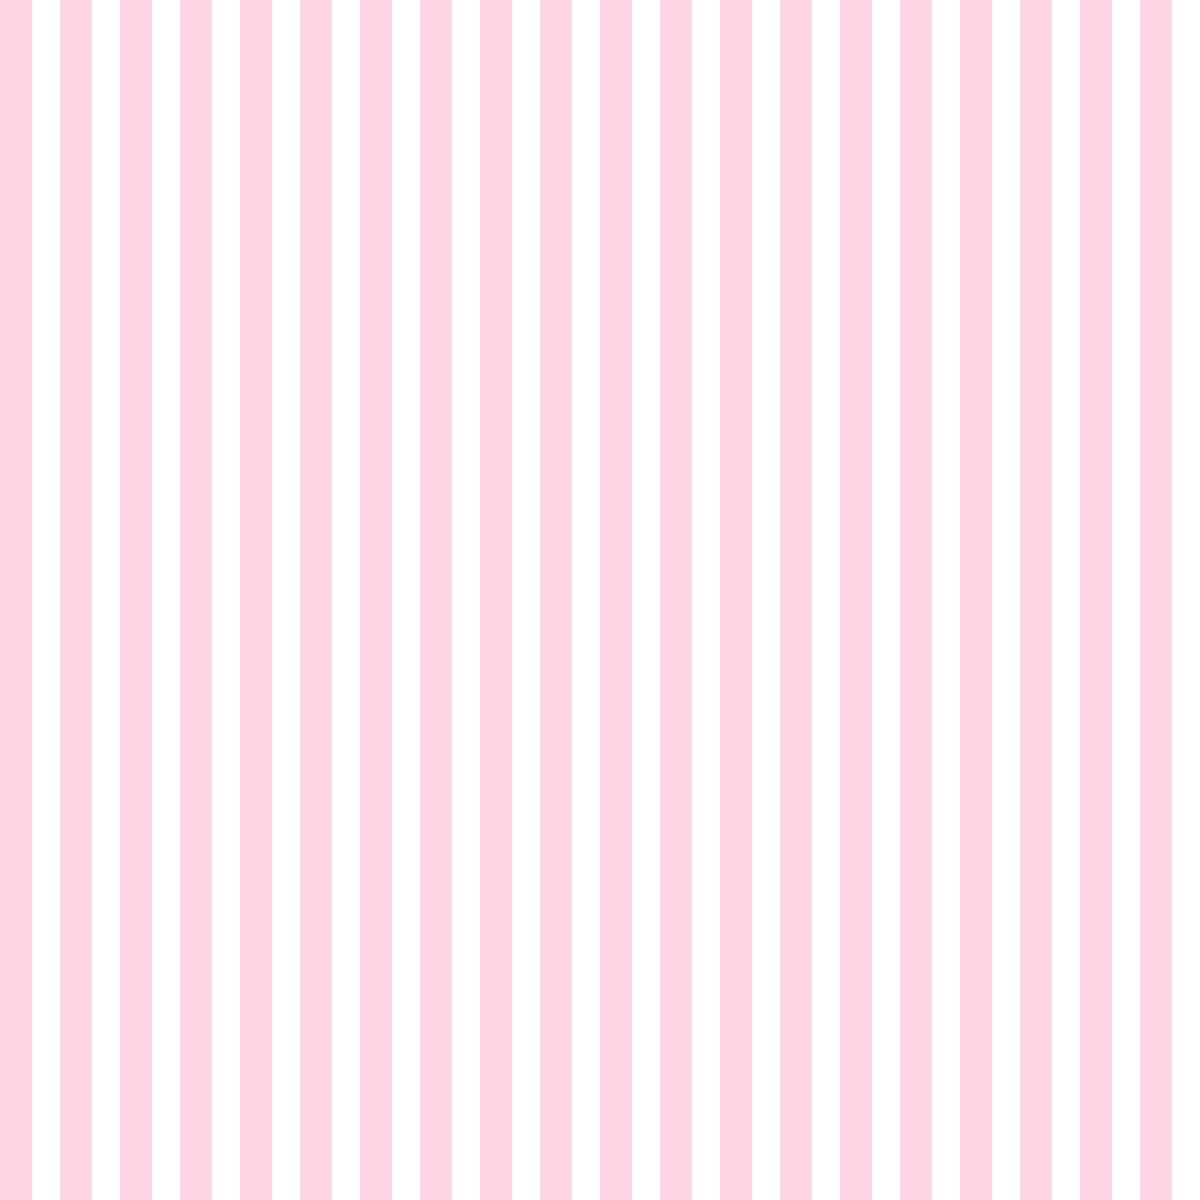 Free Digital Striped Scrapbooking Paper Ausdruckbares Geschenkpapier Freebie Meinlilapa Pink Stripes Background Striped Background Pink And White Stripes